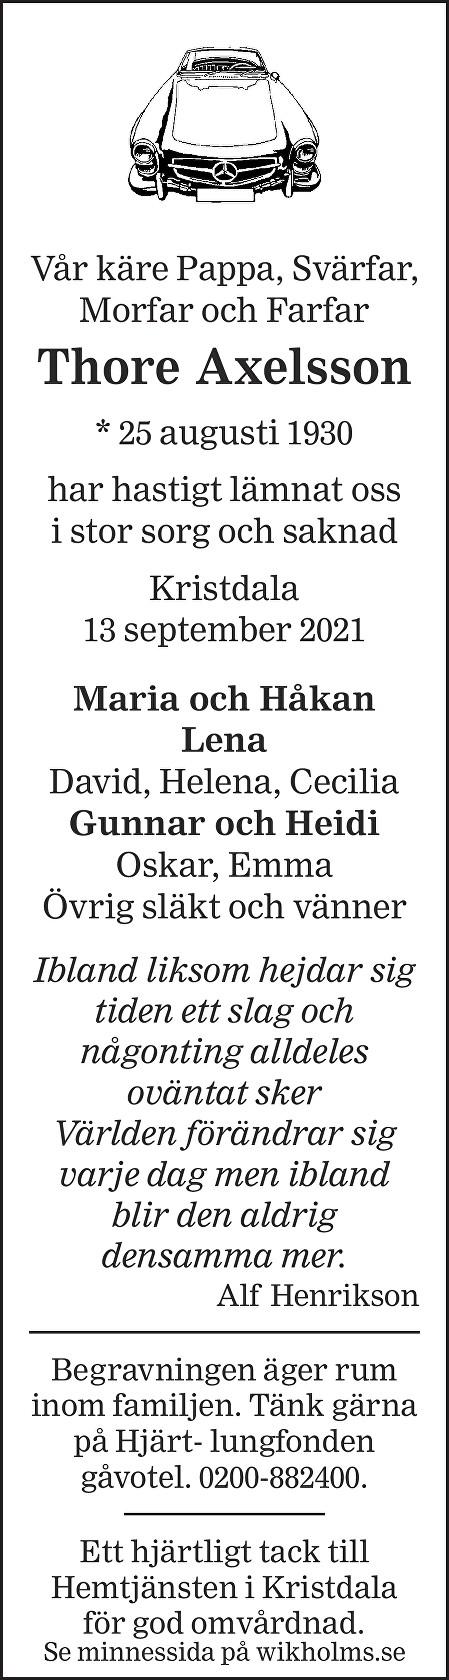 Thore Axelsson Death notice